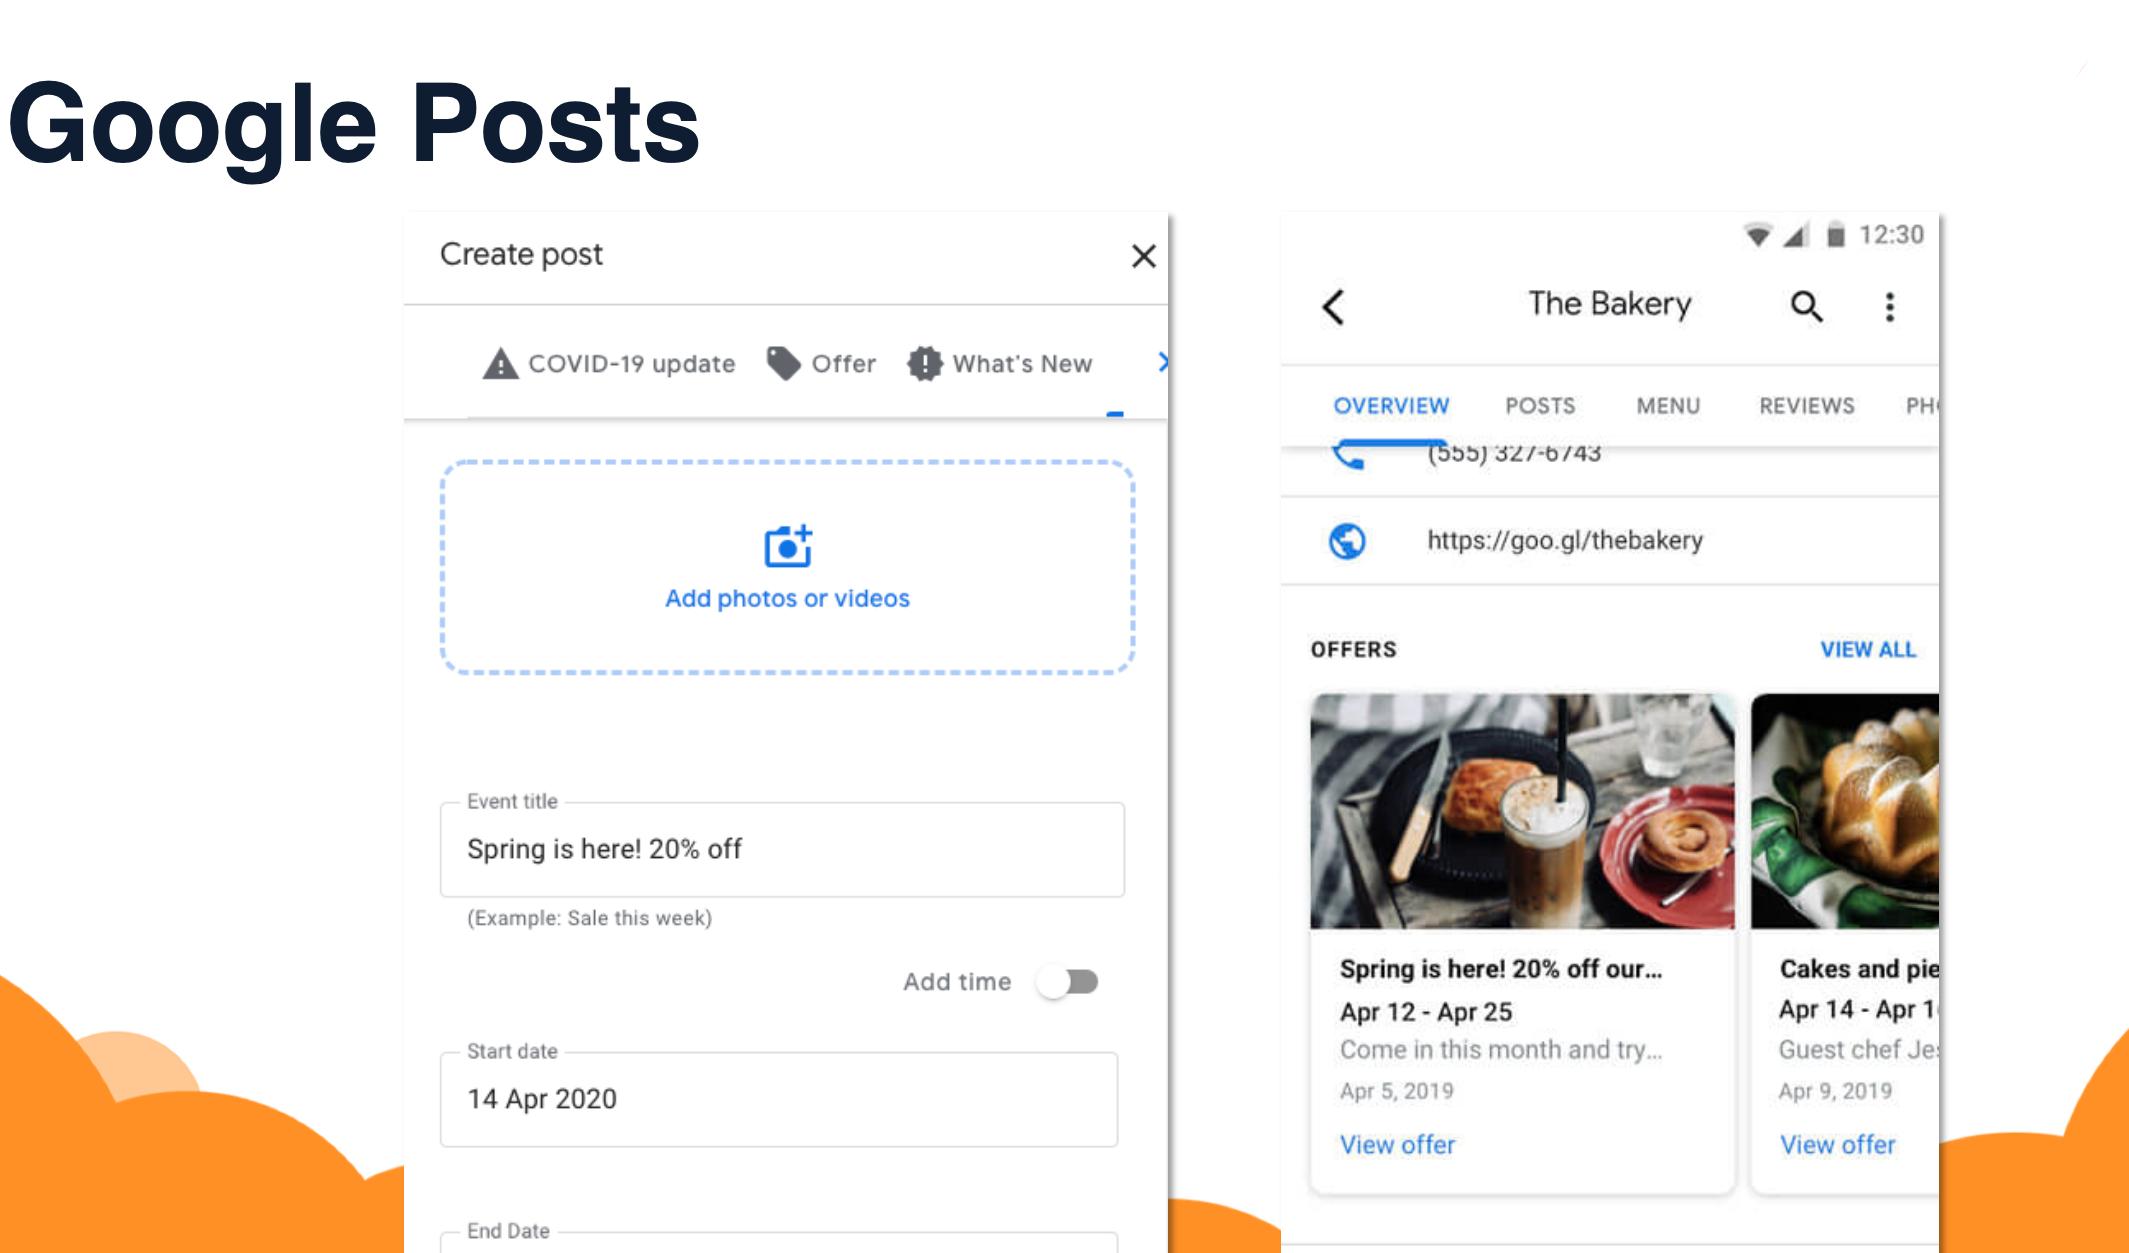 The Bakery Google Posts